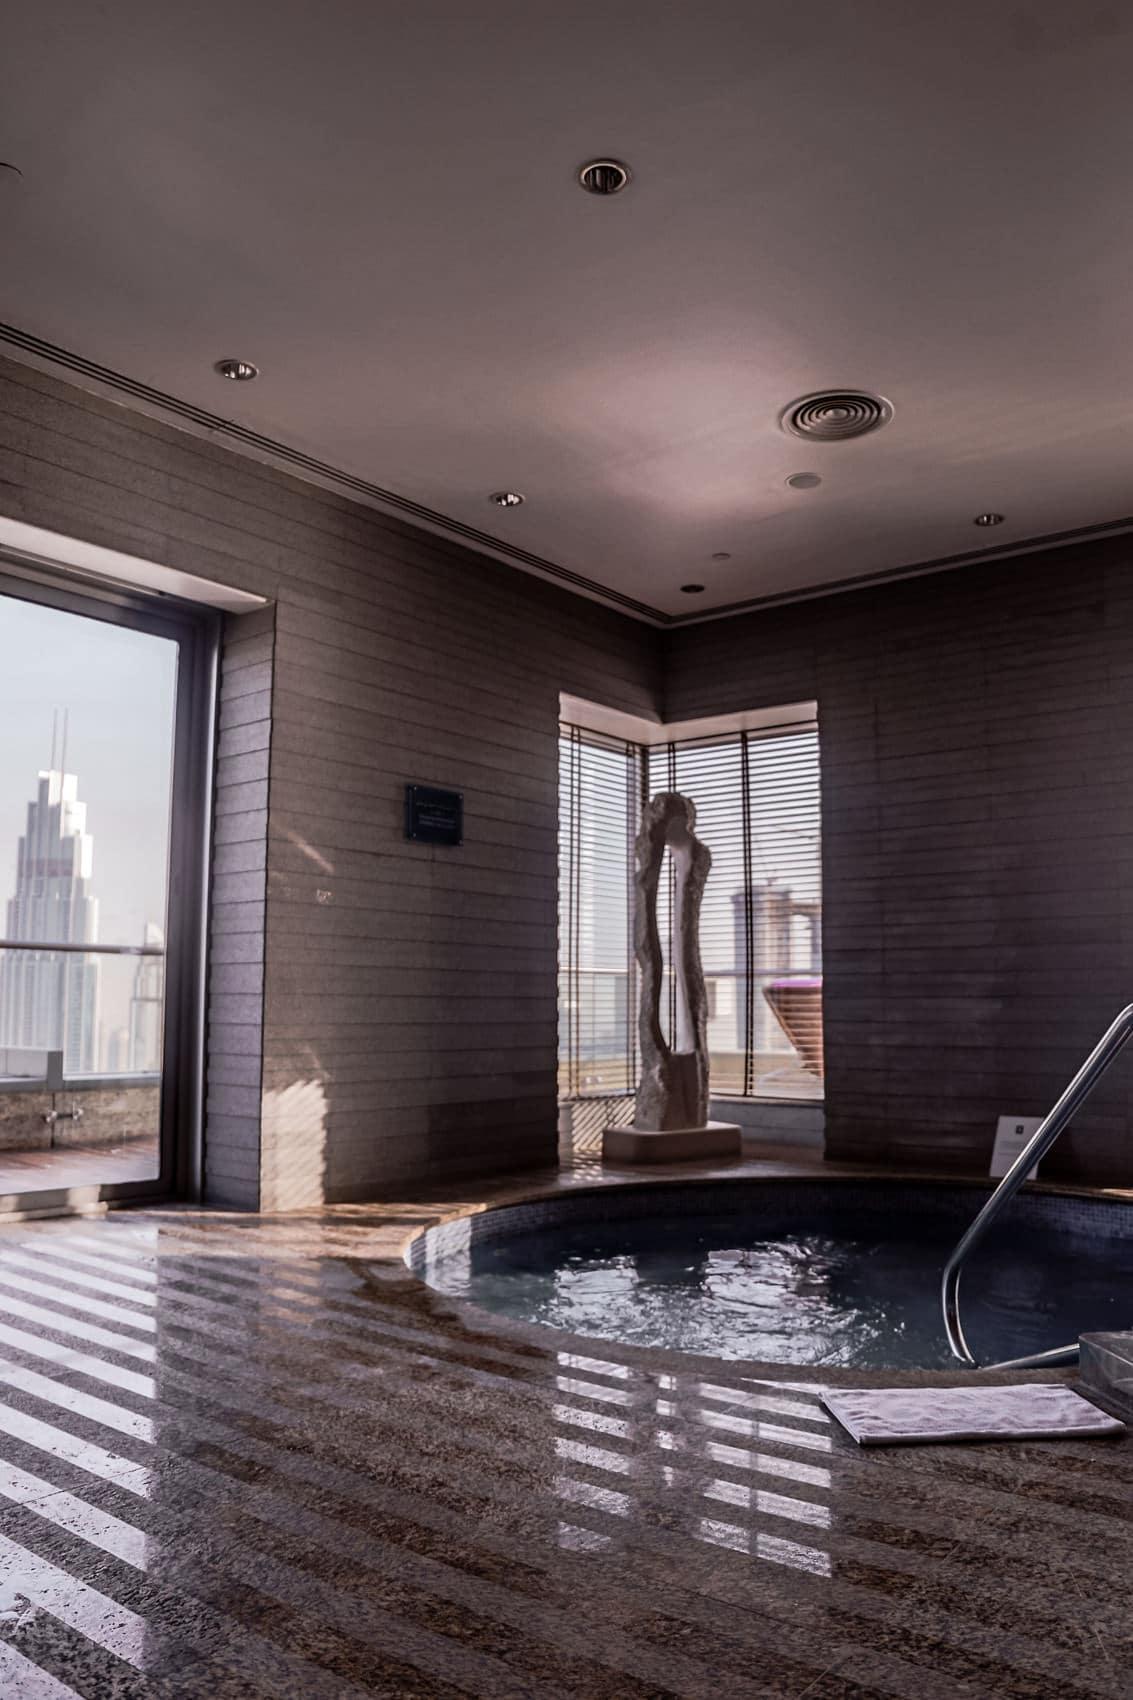 luxushotel-shangri-la-dubai-zimmer-pool-mit-blick-auf-den-burj-khalifa-reiseblog-des-belles-choses 37